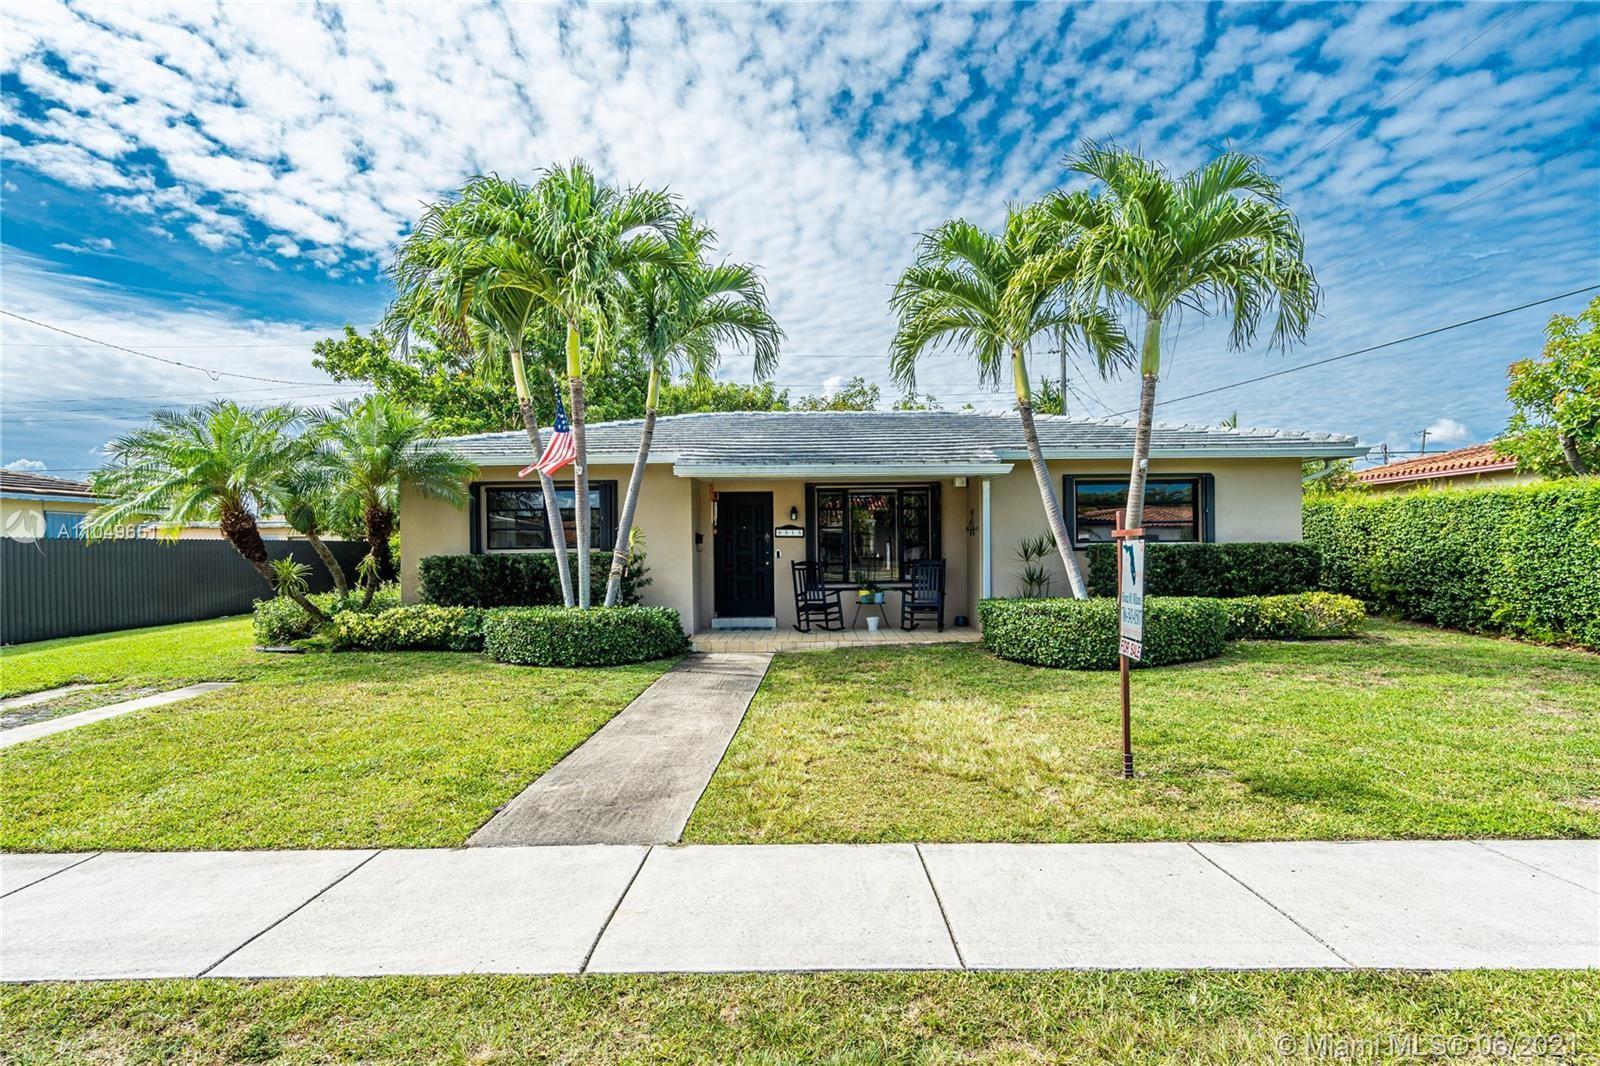 8515 SW 43rd St, Miami, FL 33155 - #: A11049651